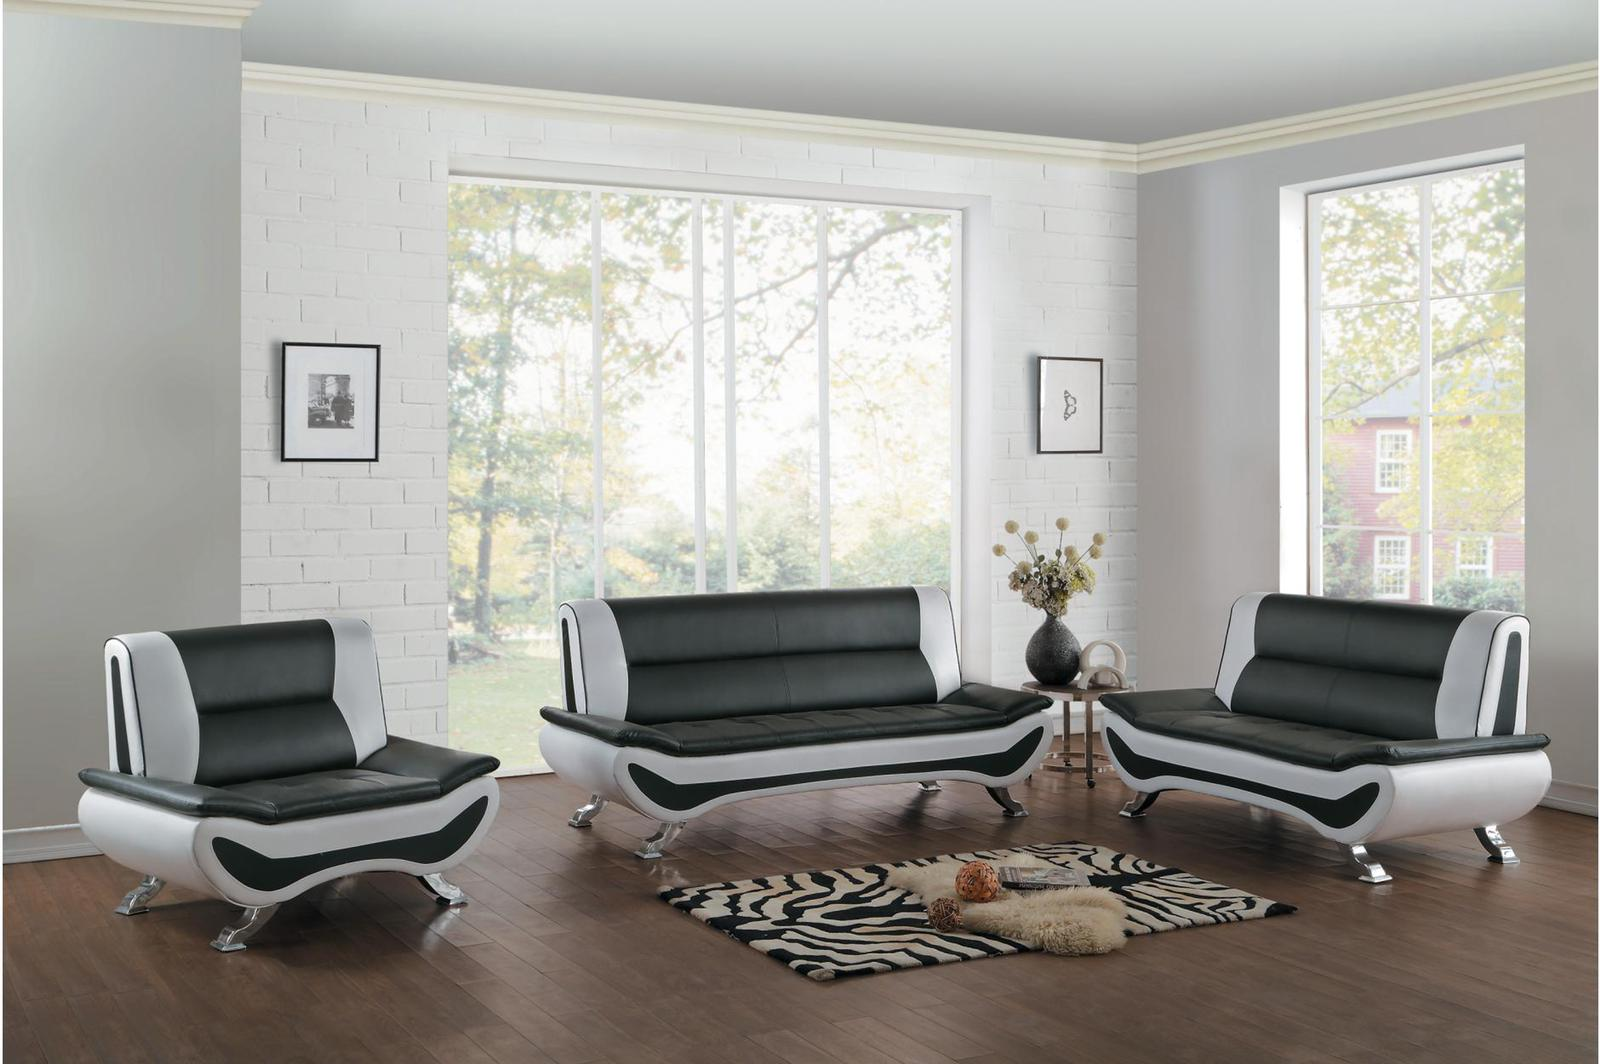 furniture-houston (5)